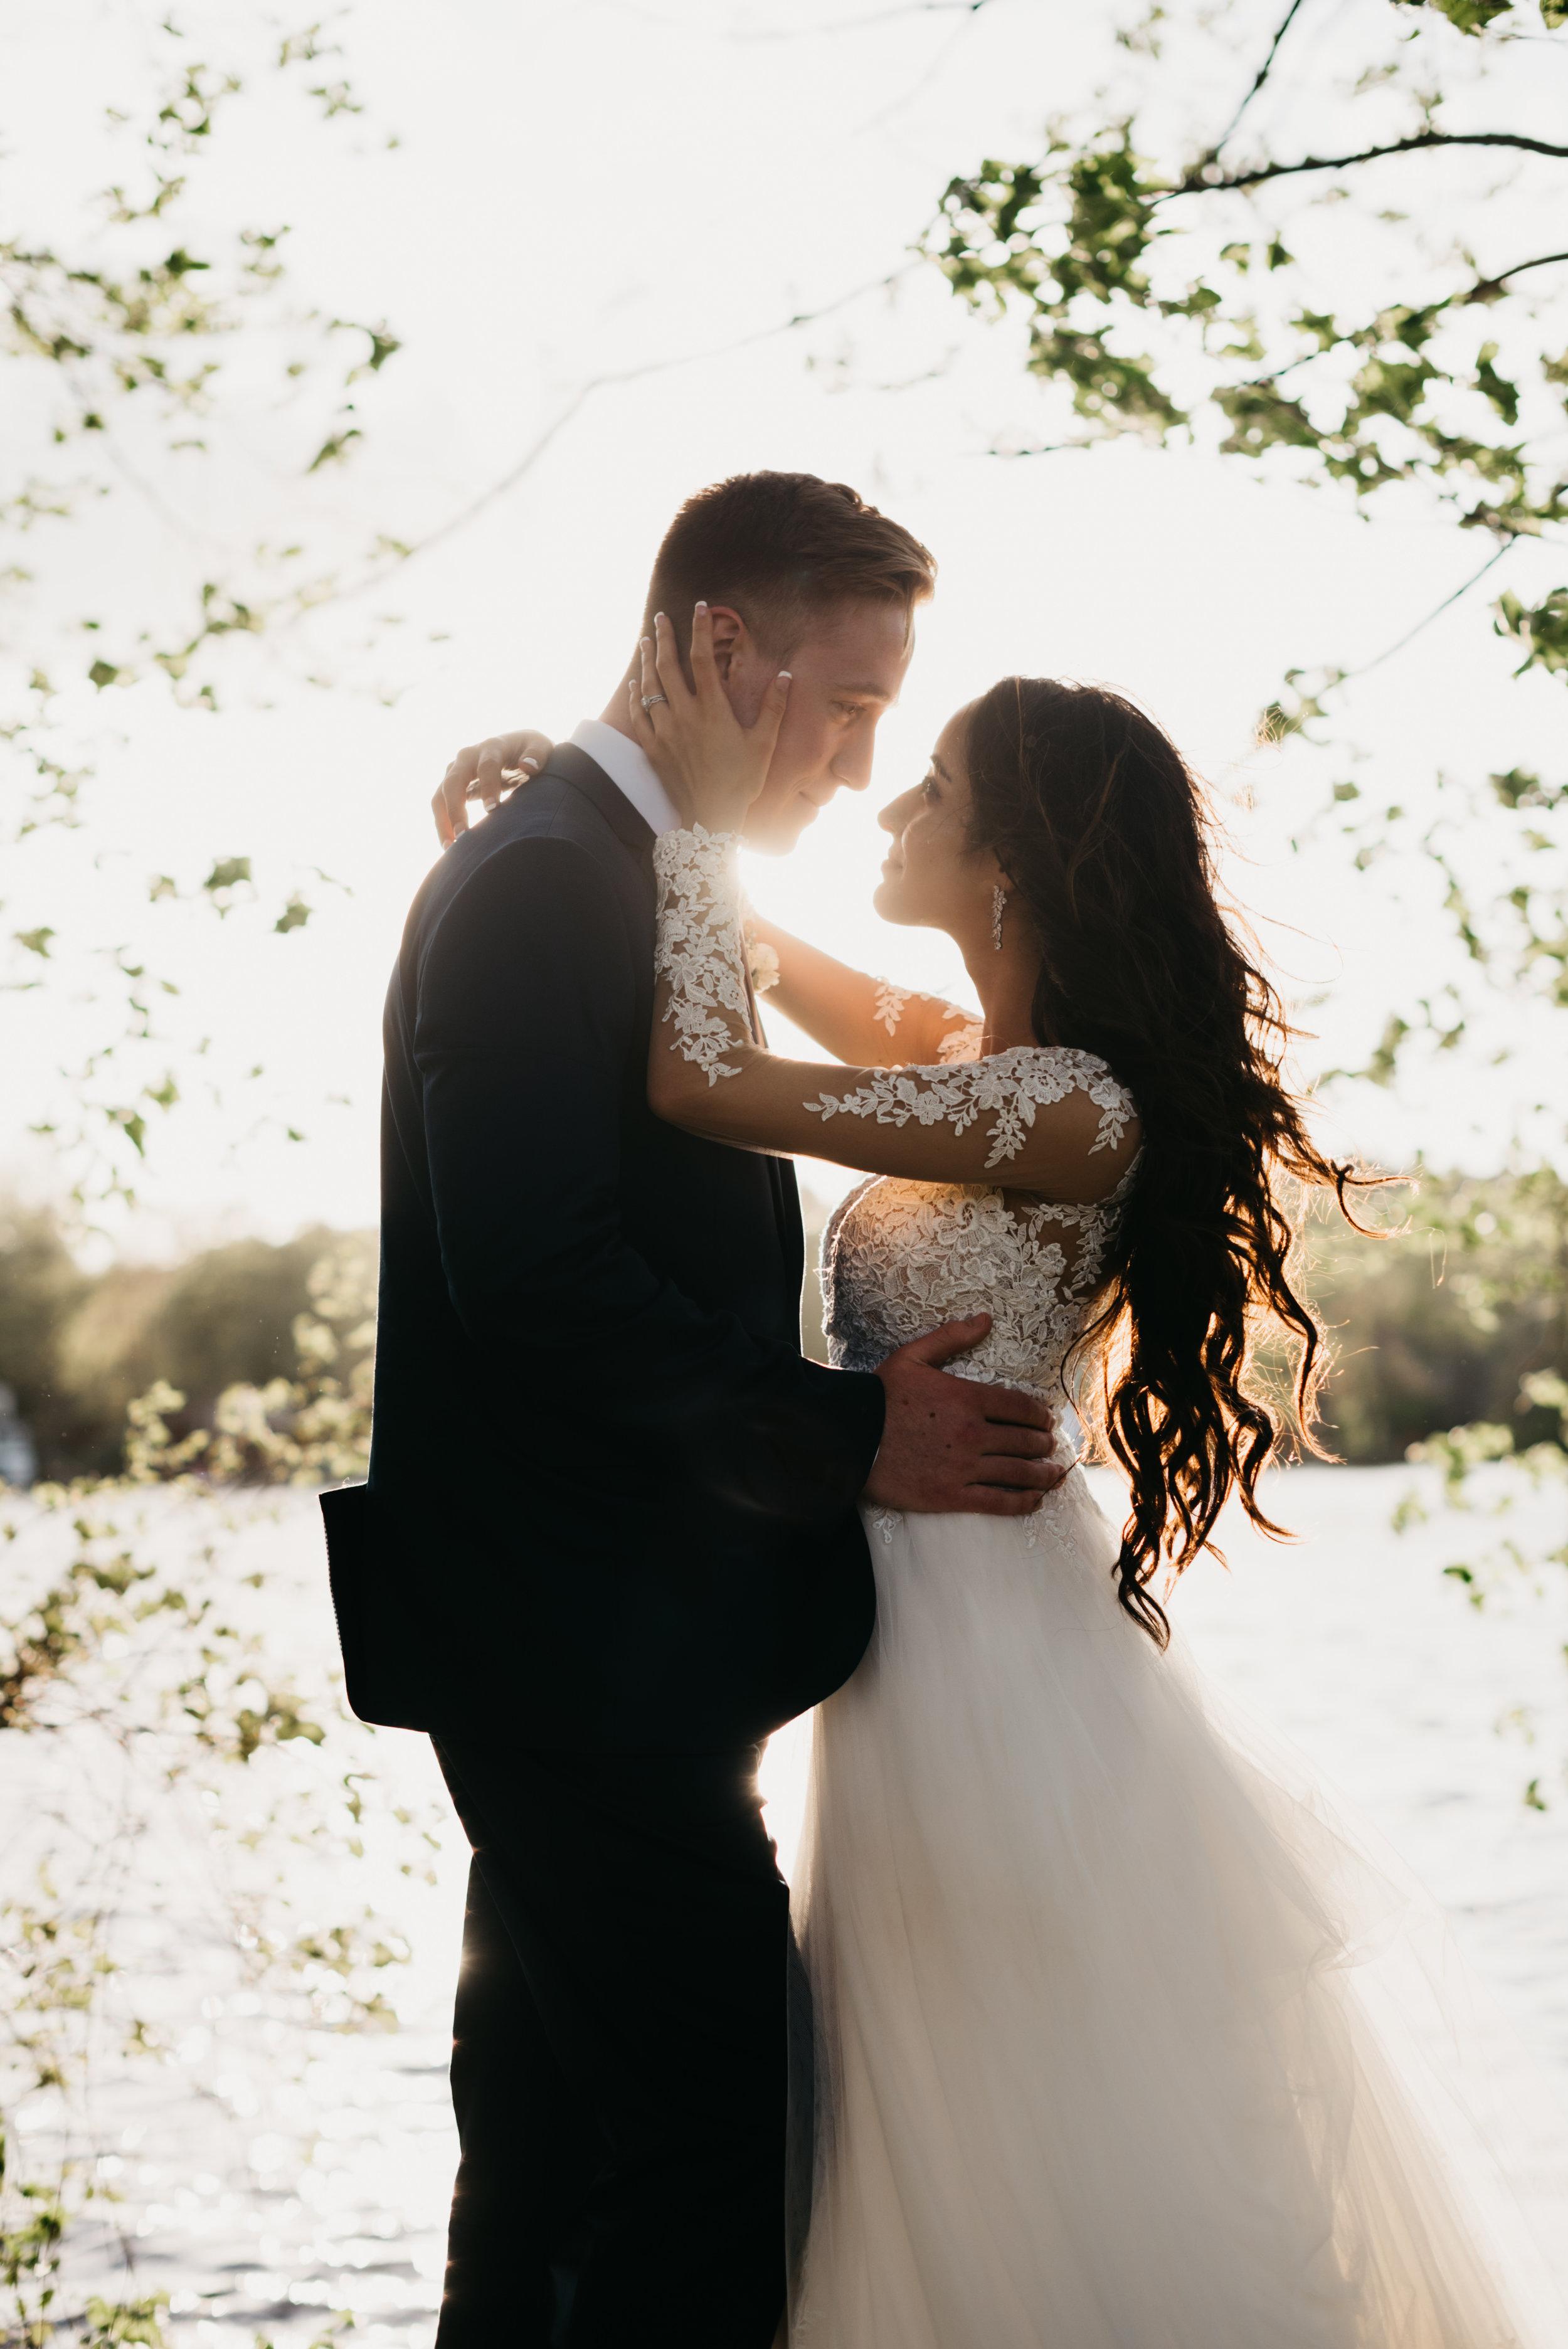 Barch-Massachusetts-Lakeside Tent Wedding-Western Massachusetts Wedding Photographer-02937.jpg